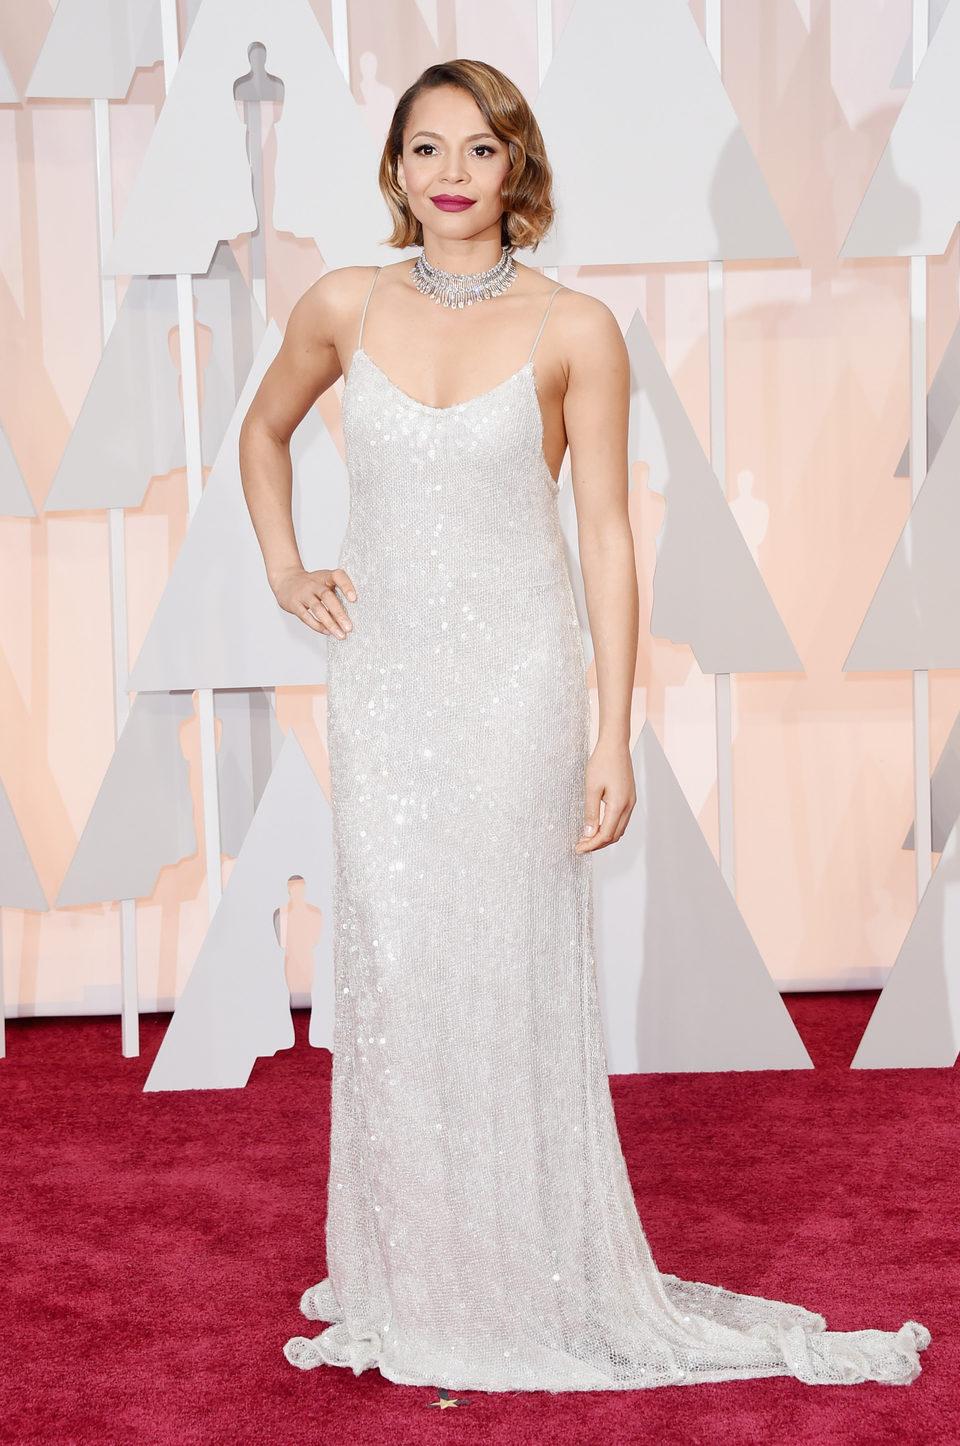 Carmen Ejogo at the Oscars Awards 2015 red carpet